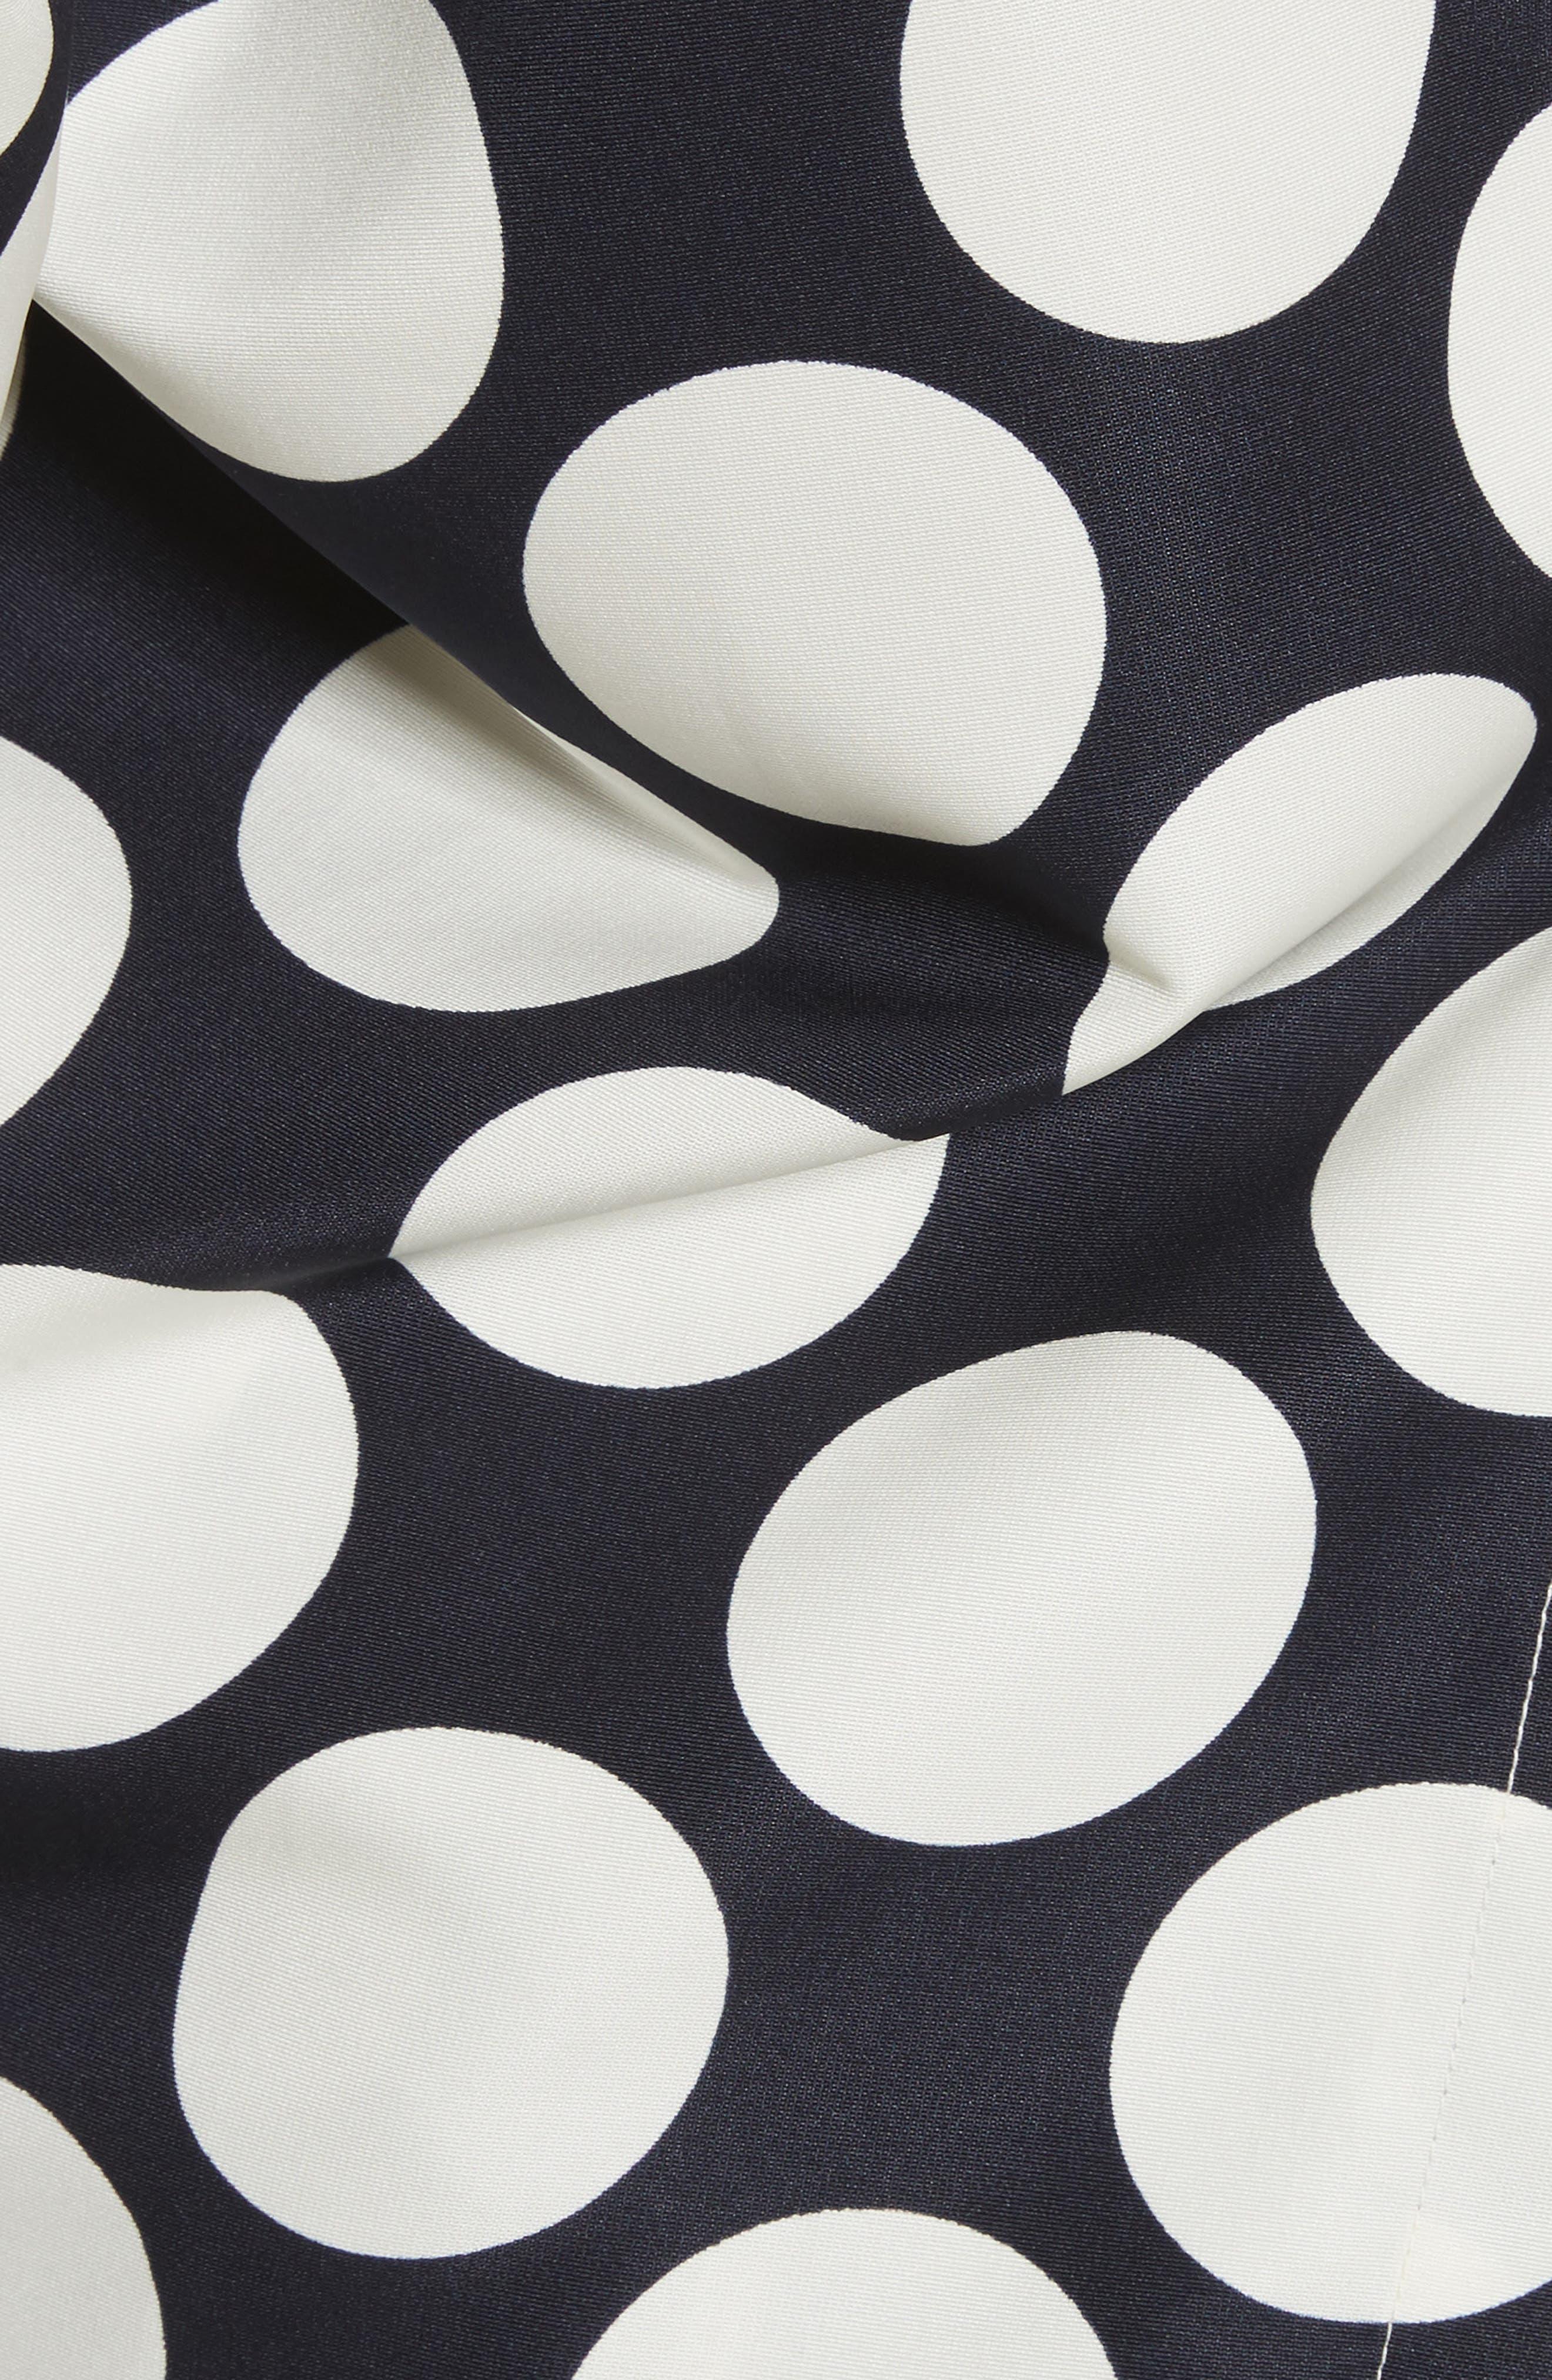 Giant Polka Dot Twisted One-Shoulder Top,                             Alternate thumbnail 5, color,                             410